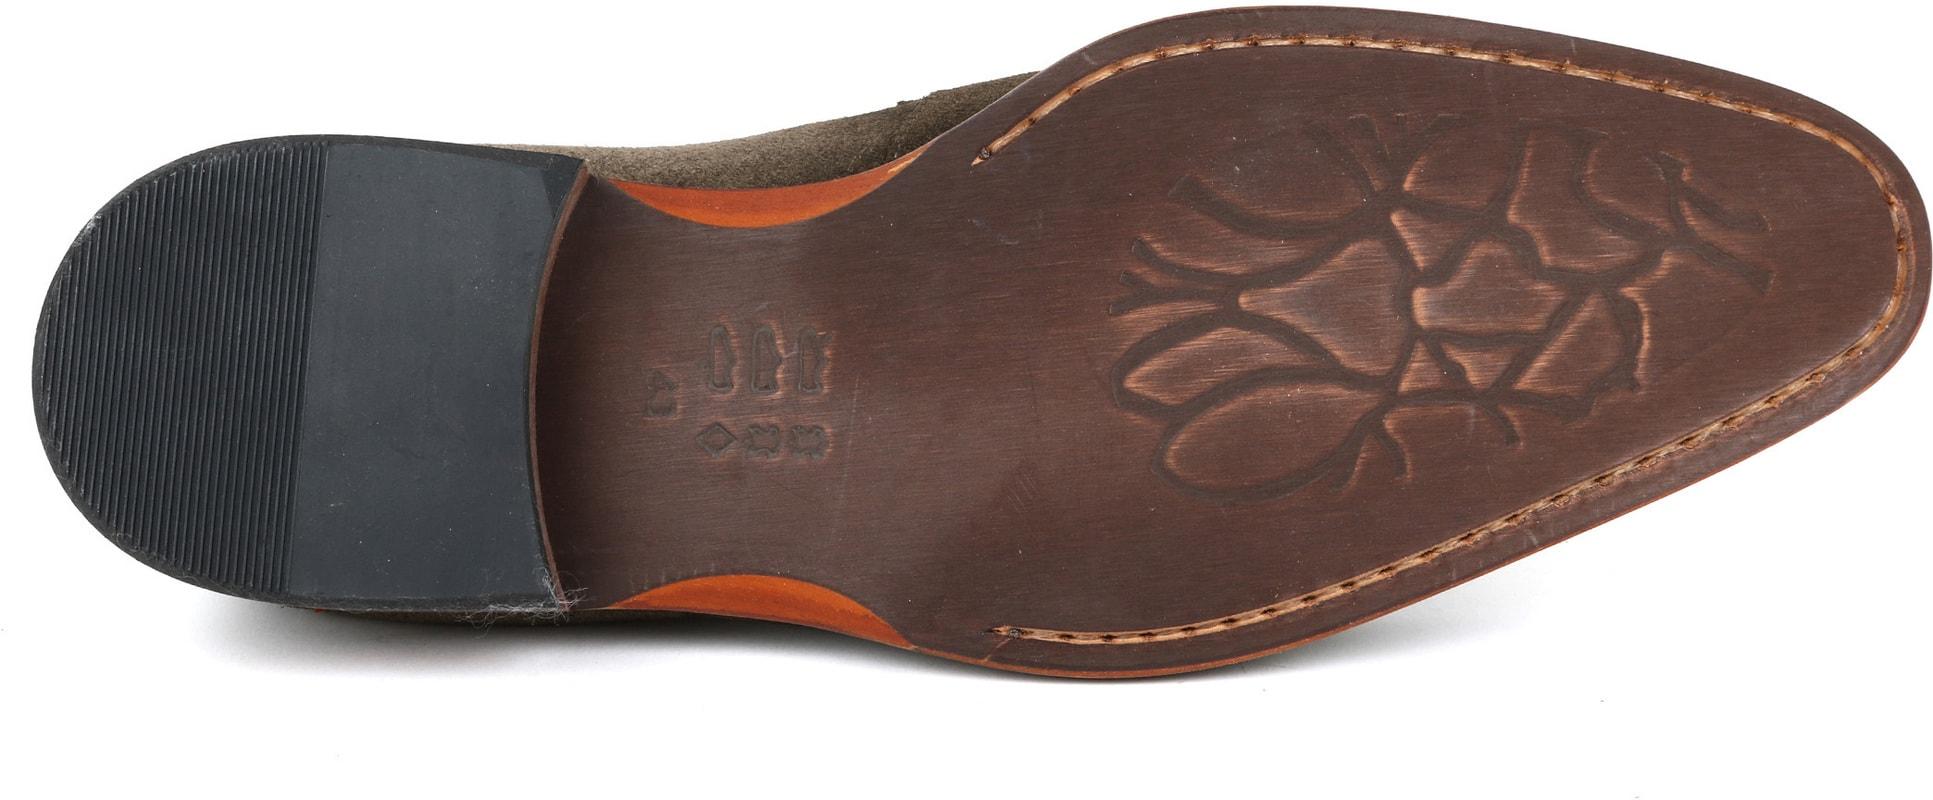 Suitable Loafer Suede Groen foto 4